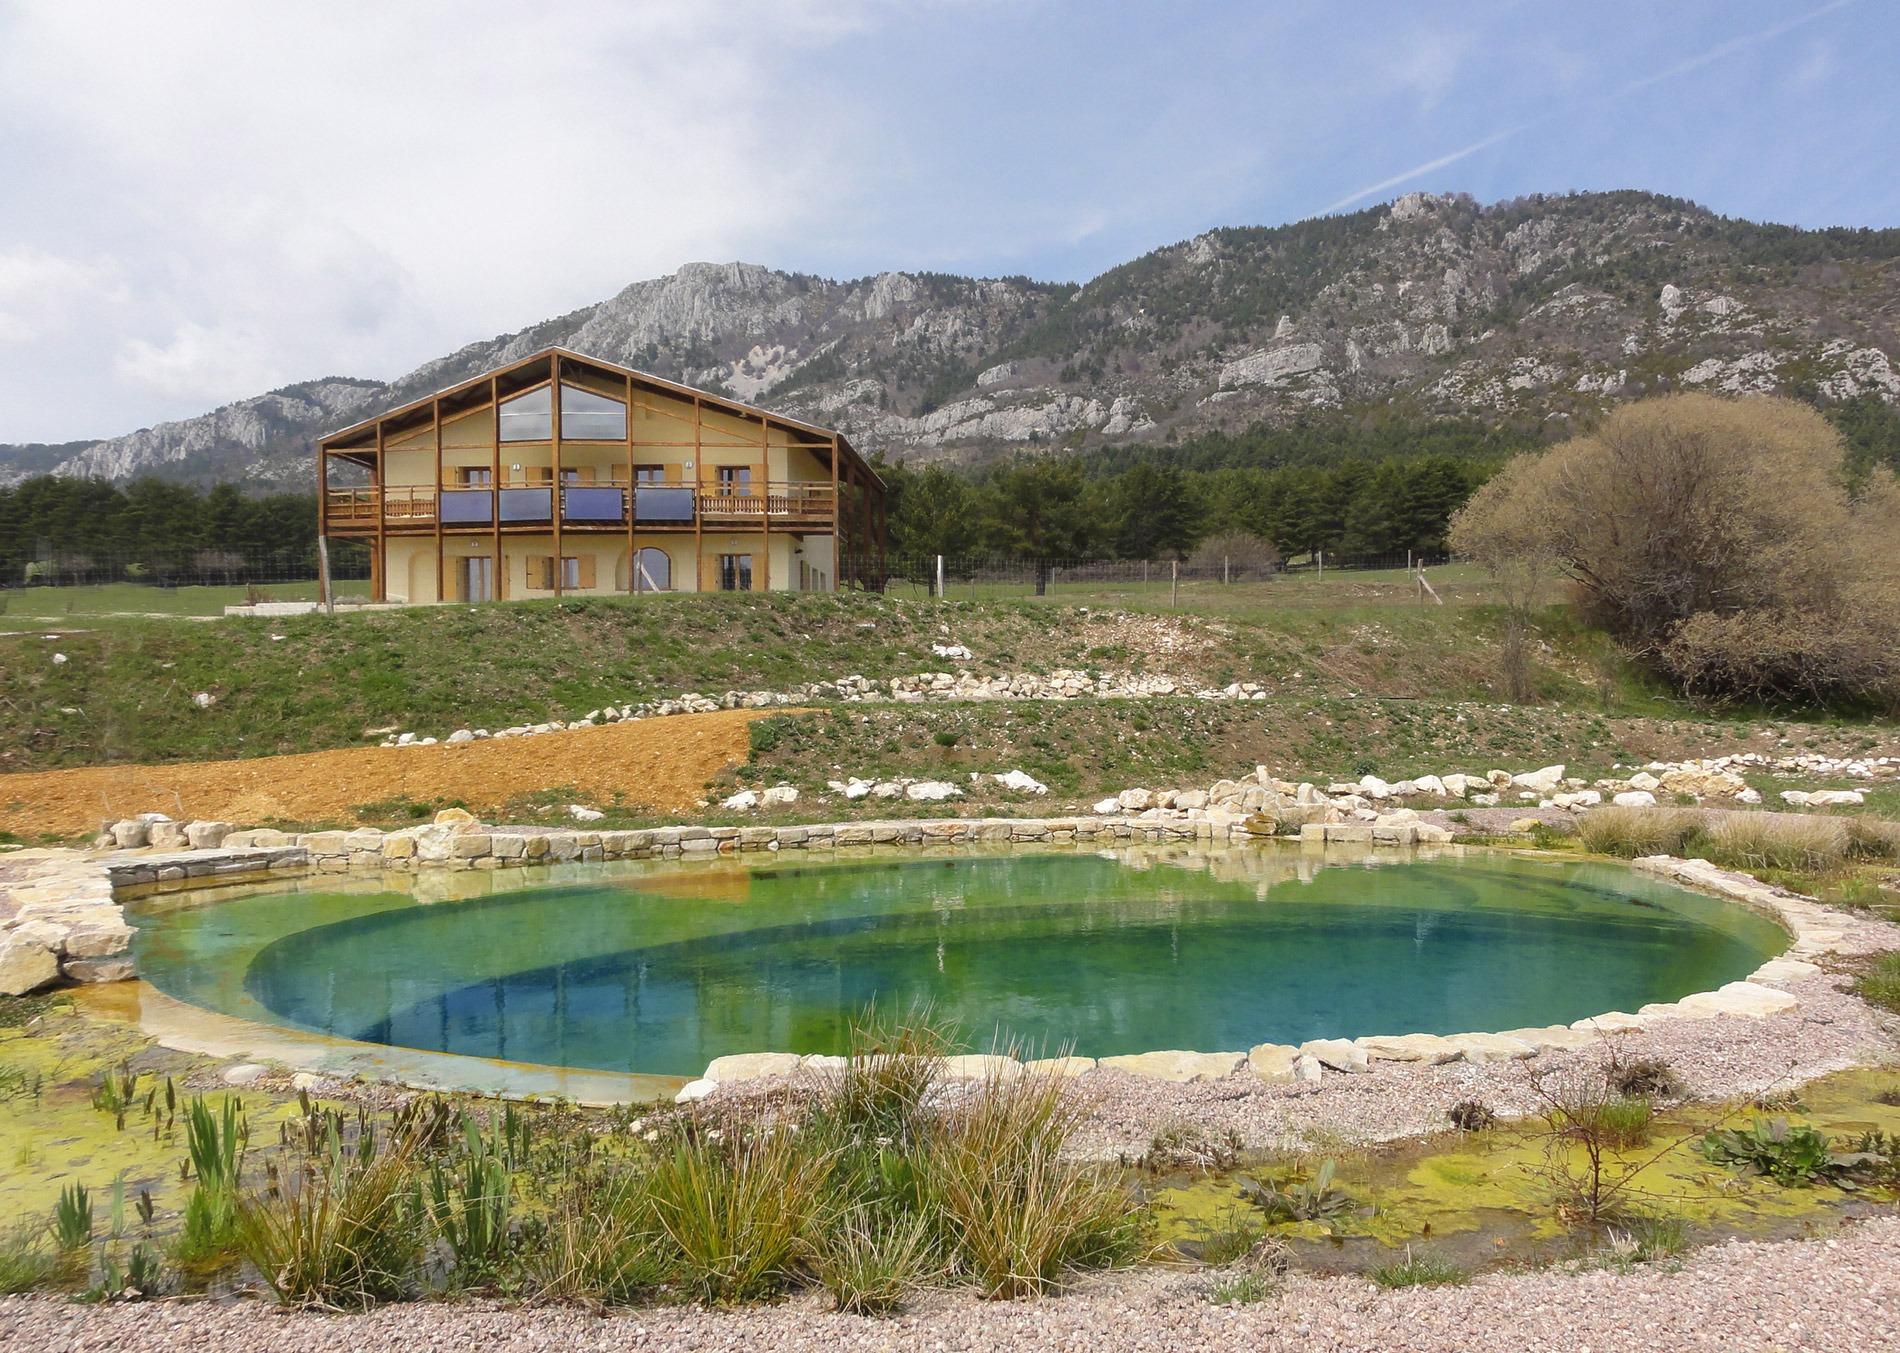 Gite & Bassin de baignade www.couleur-nature-piscine.com